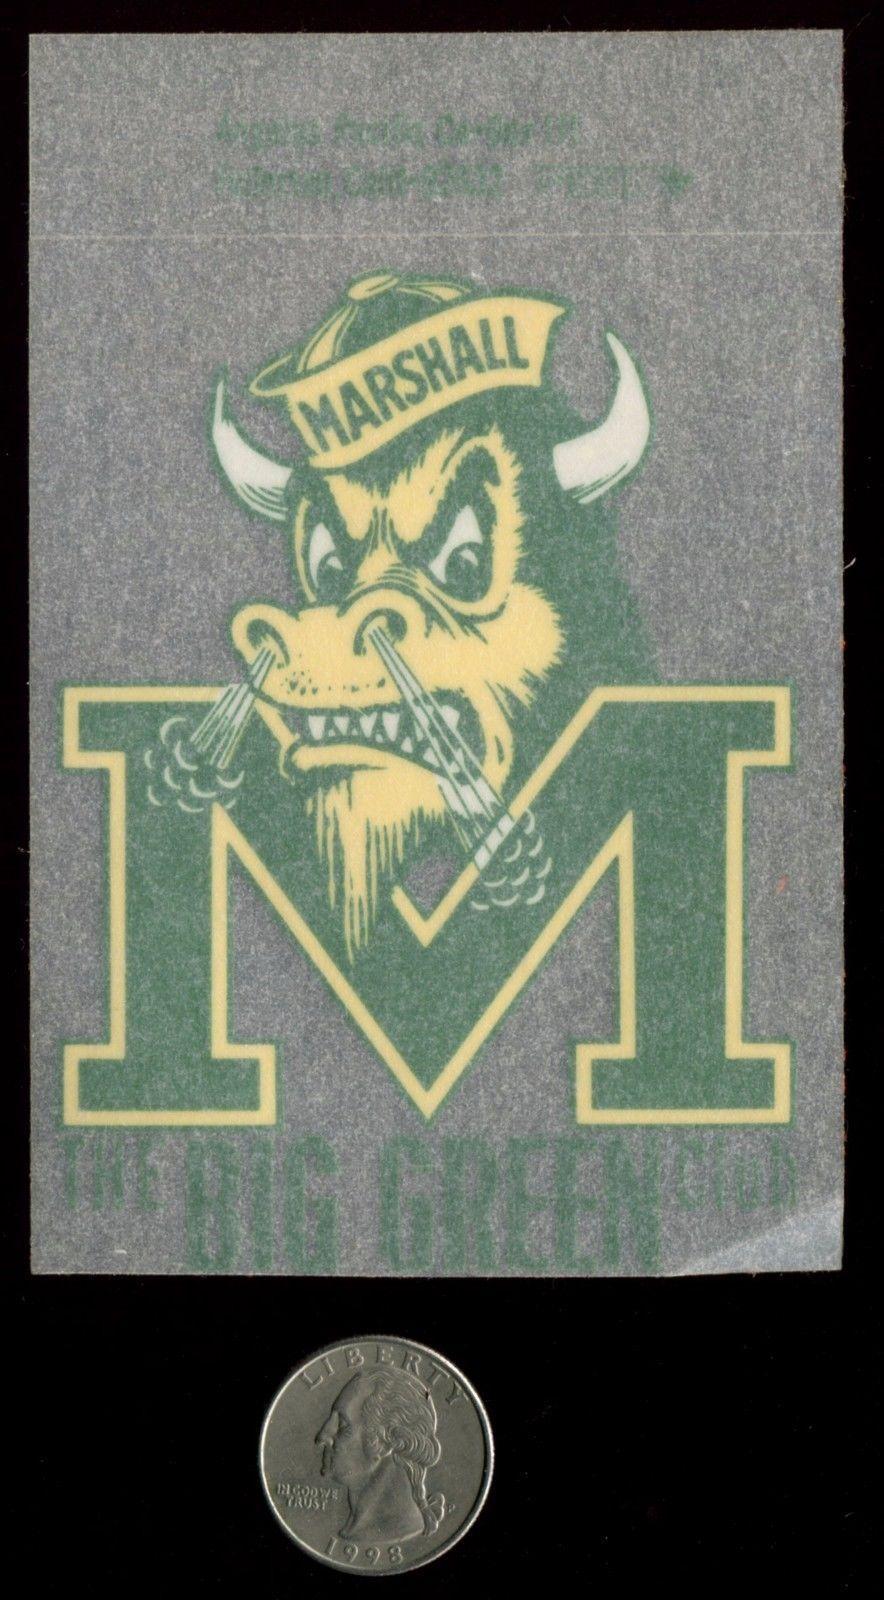 Marshall University Marco The Buffalo Vintage Souvenir Decal Nos Marshall University College Decals Vintage Souvenir